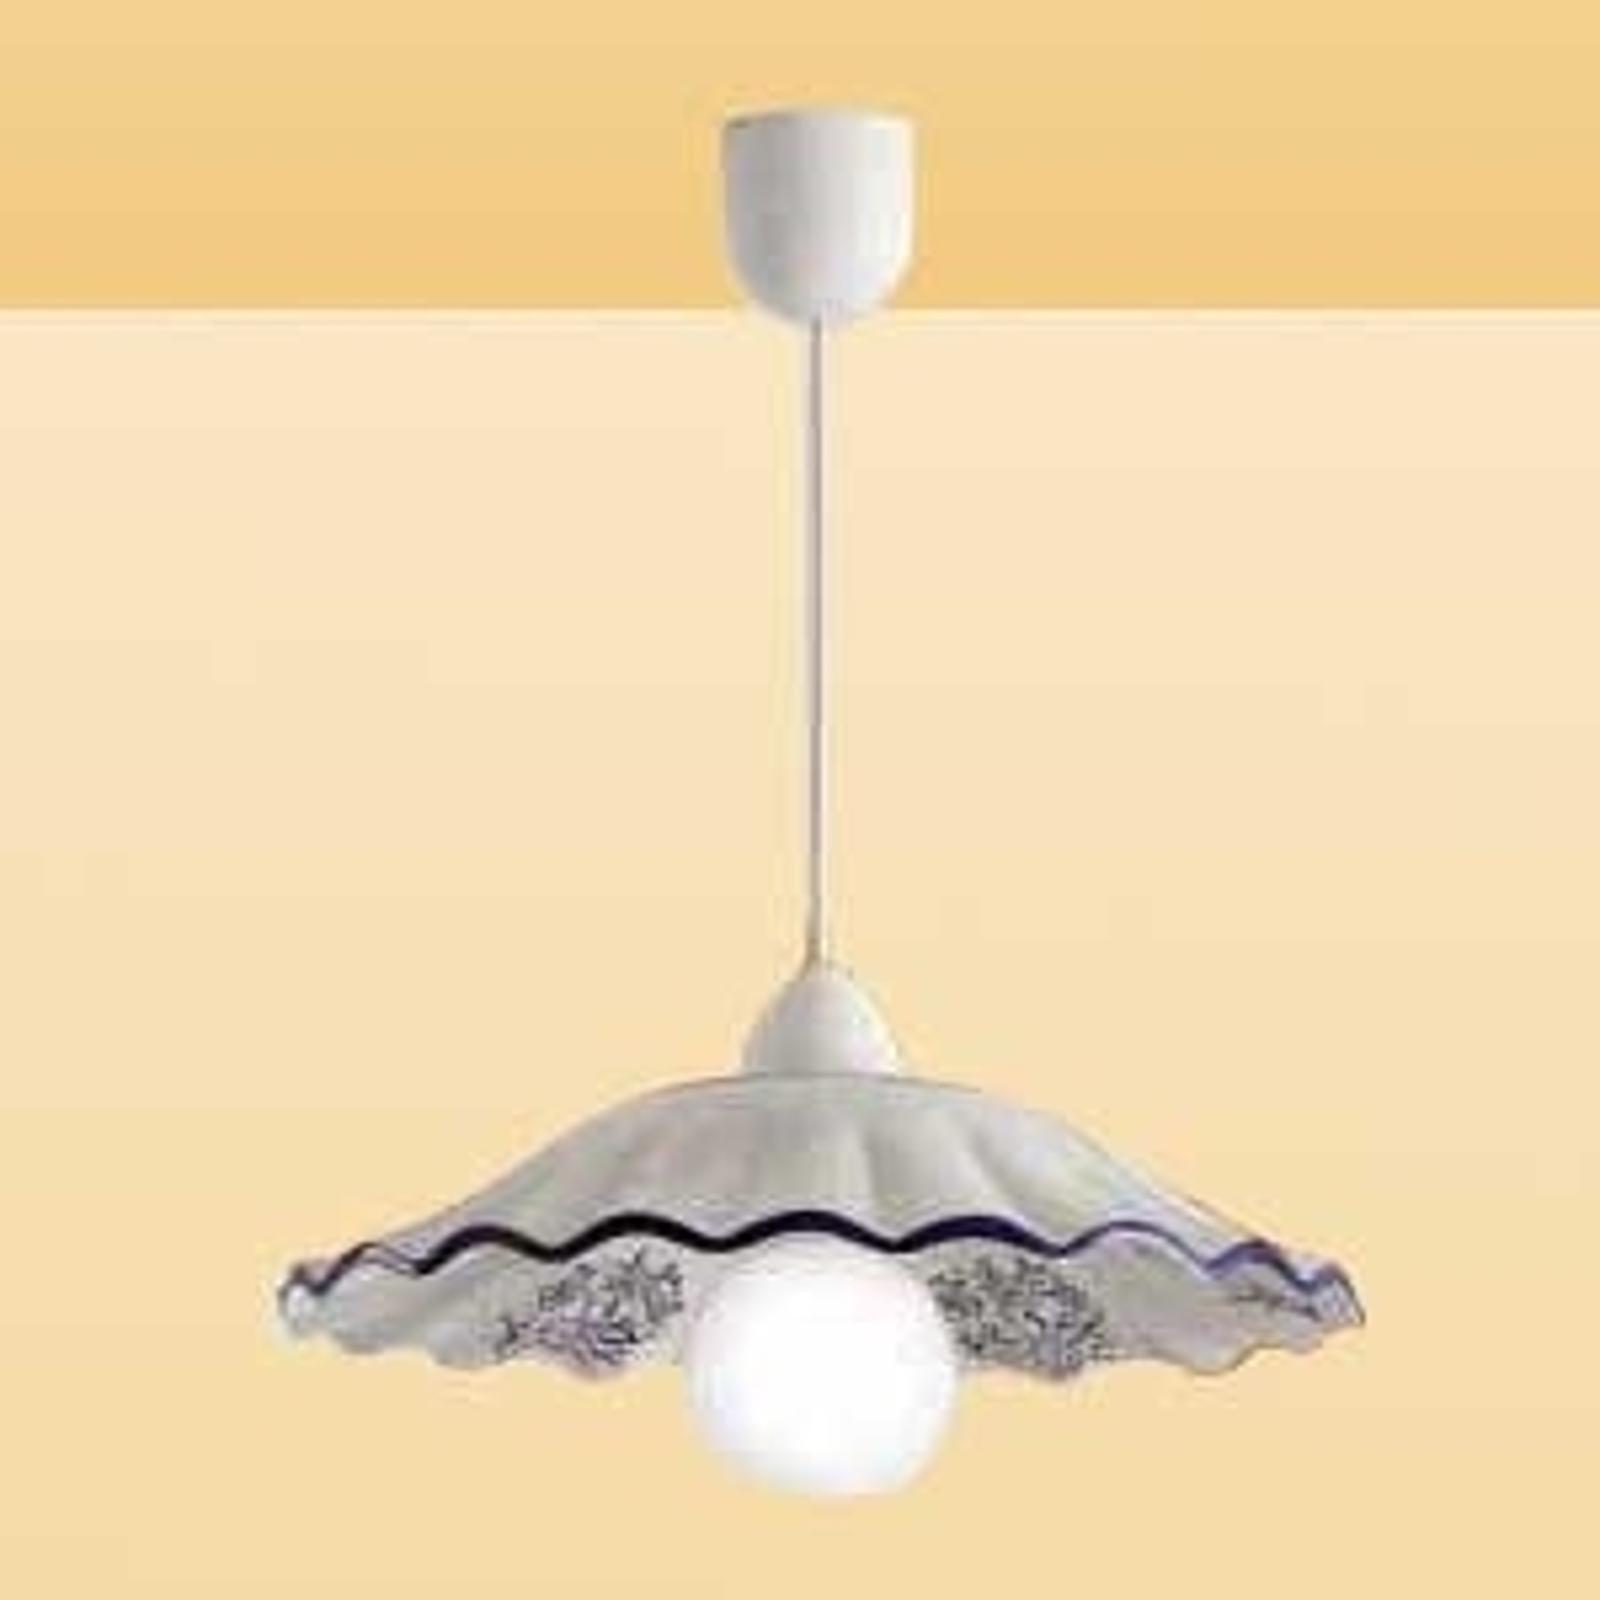 Lámpara colgante CELESTINA en un estilo romántico